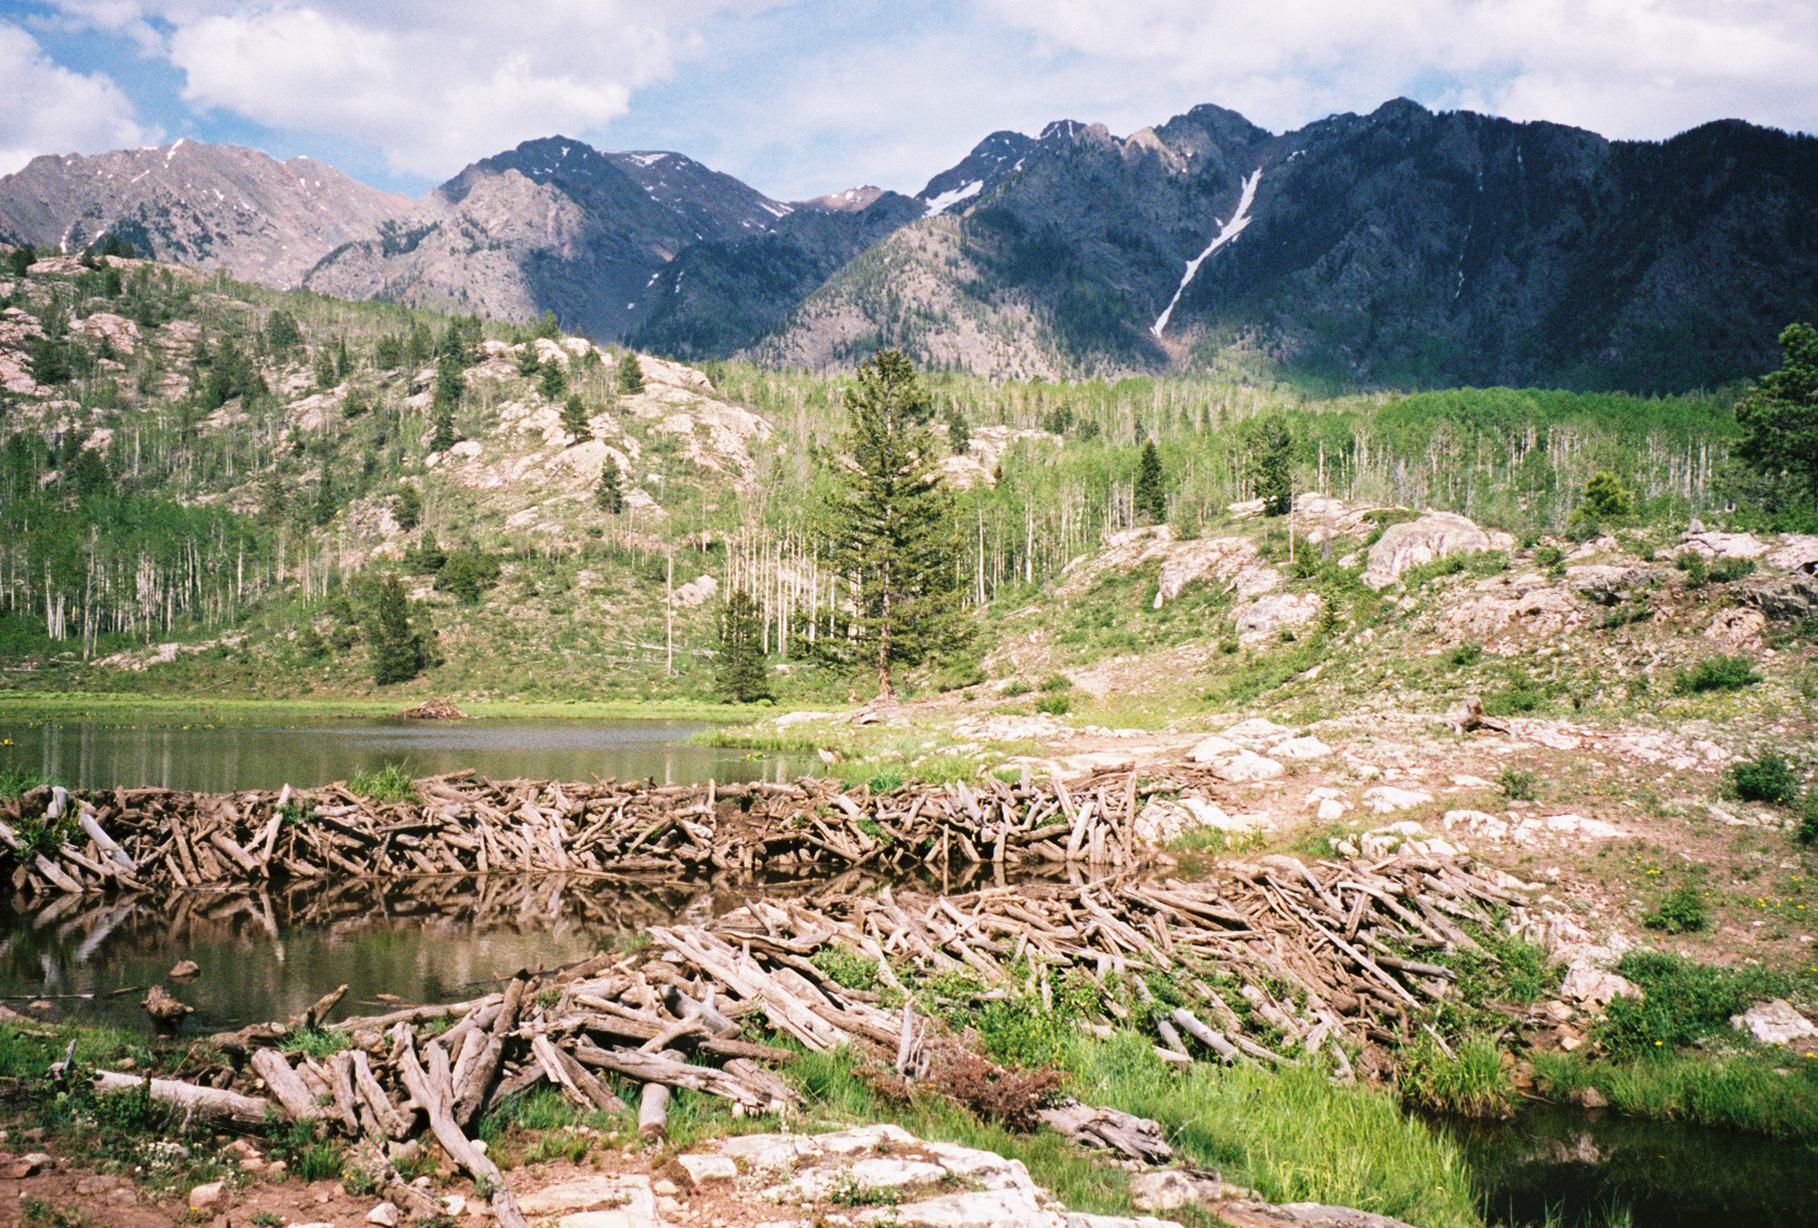 Beaver Dams at Spud Lake